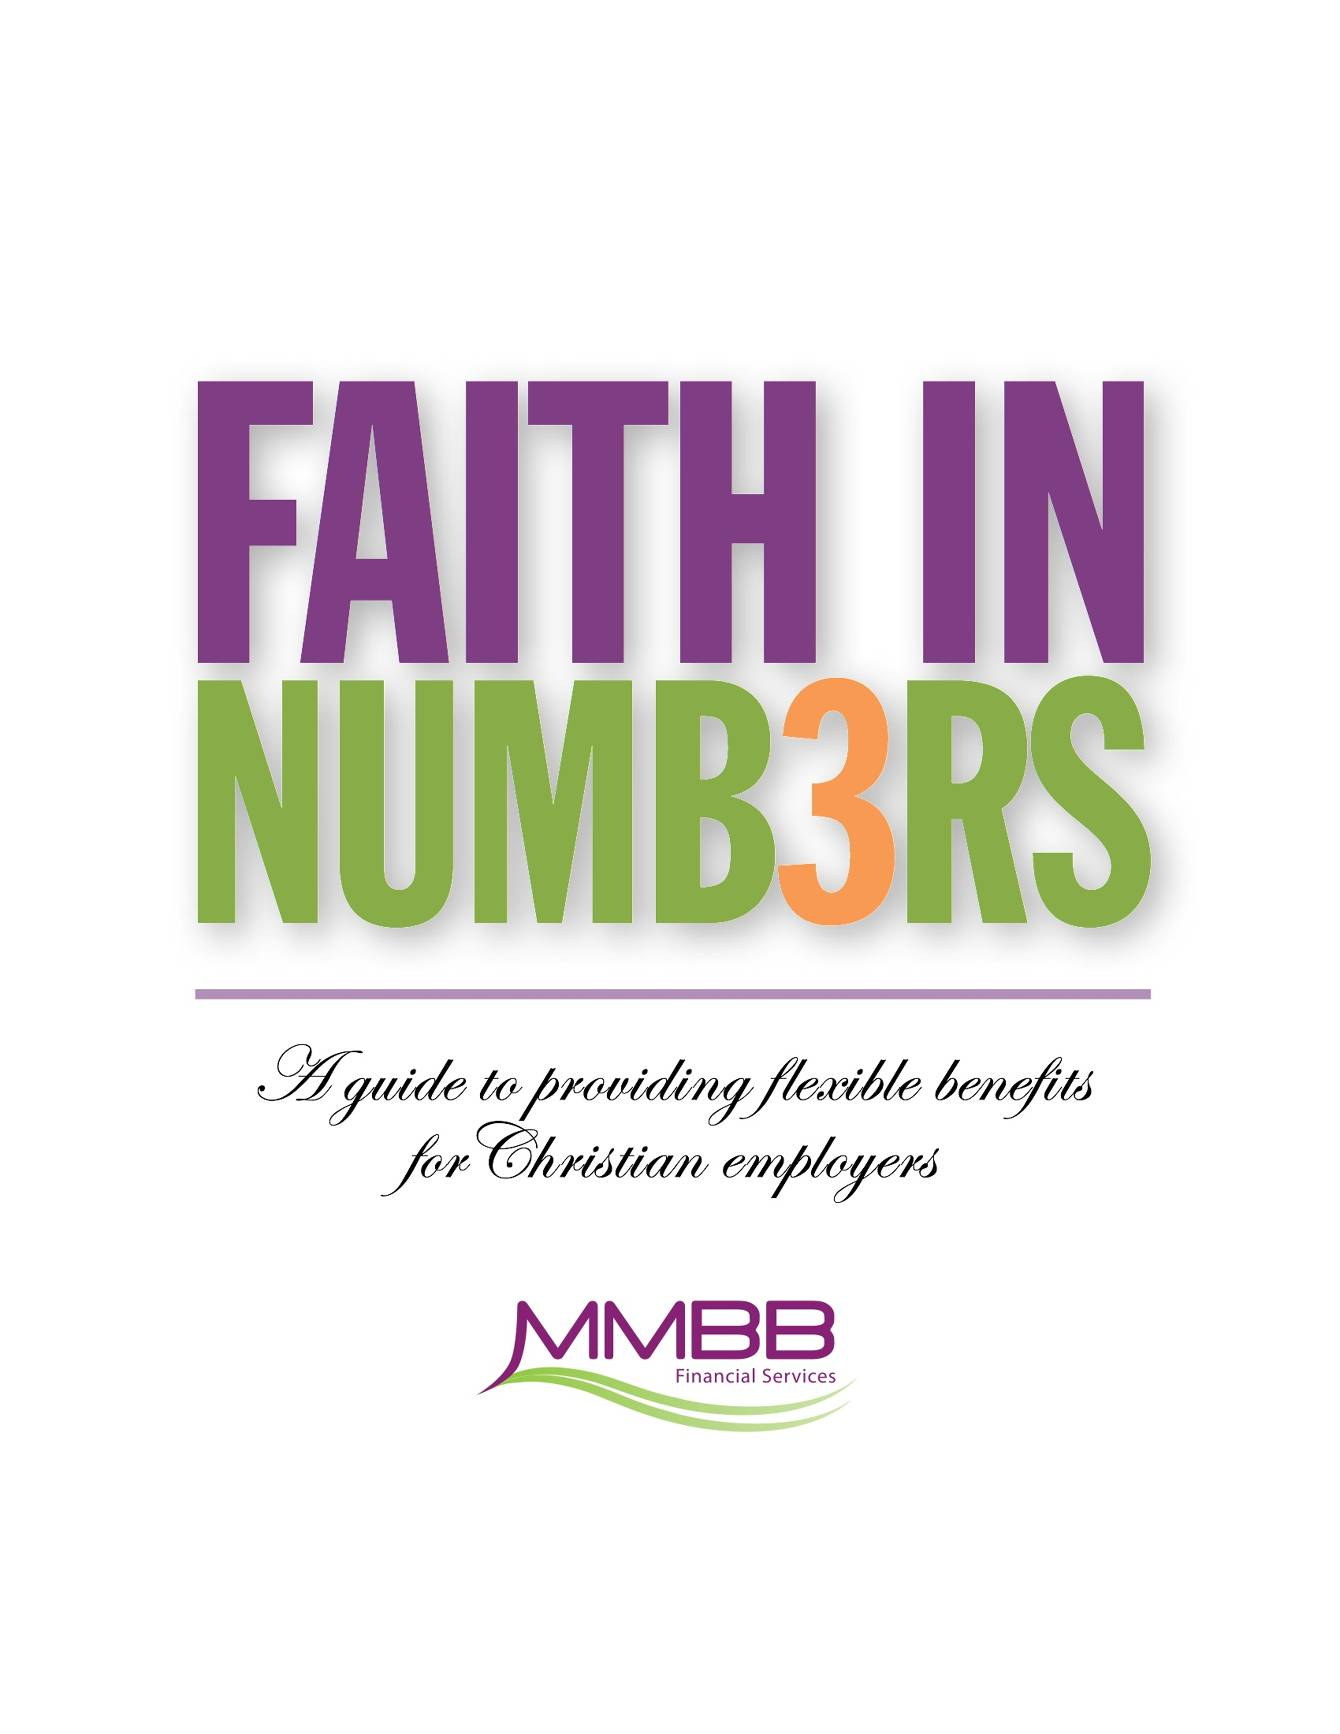 MMBB-brochure-1-1_2x.jpg